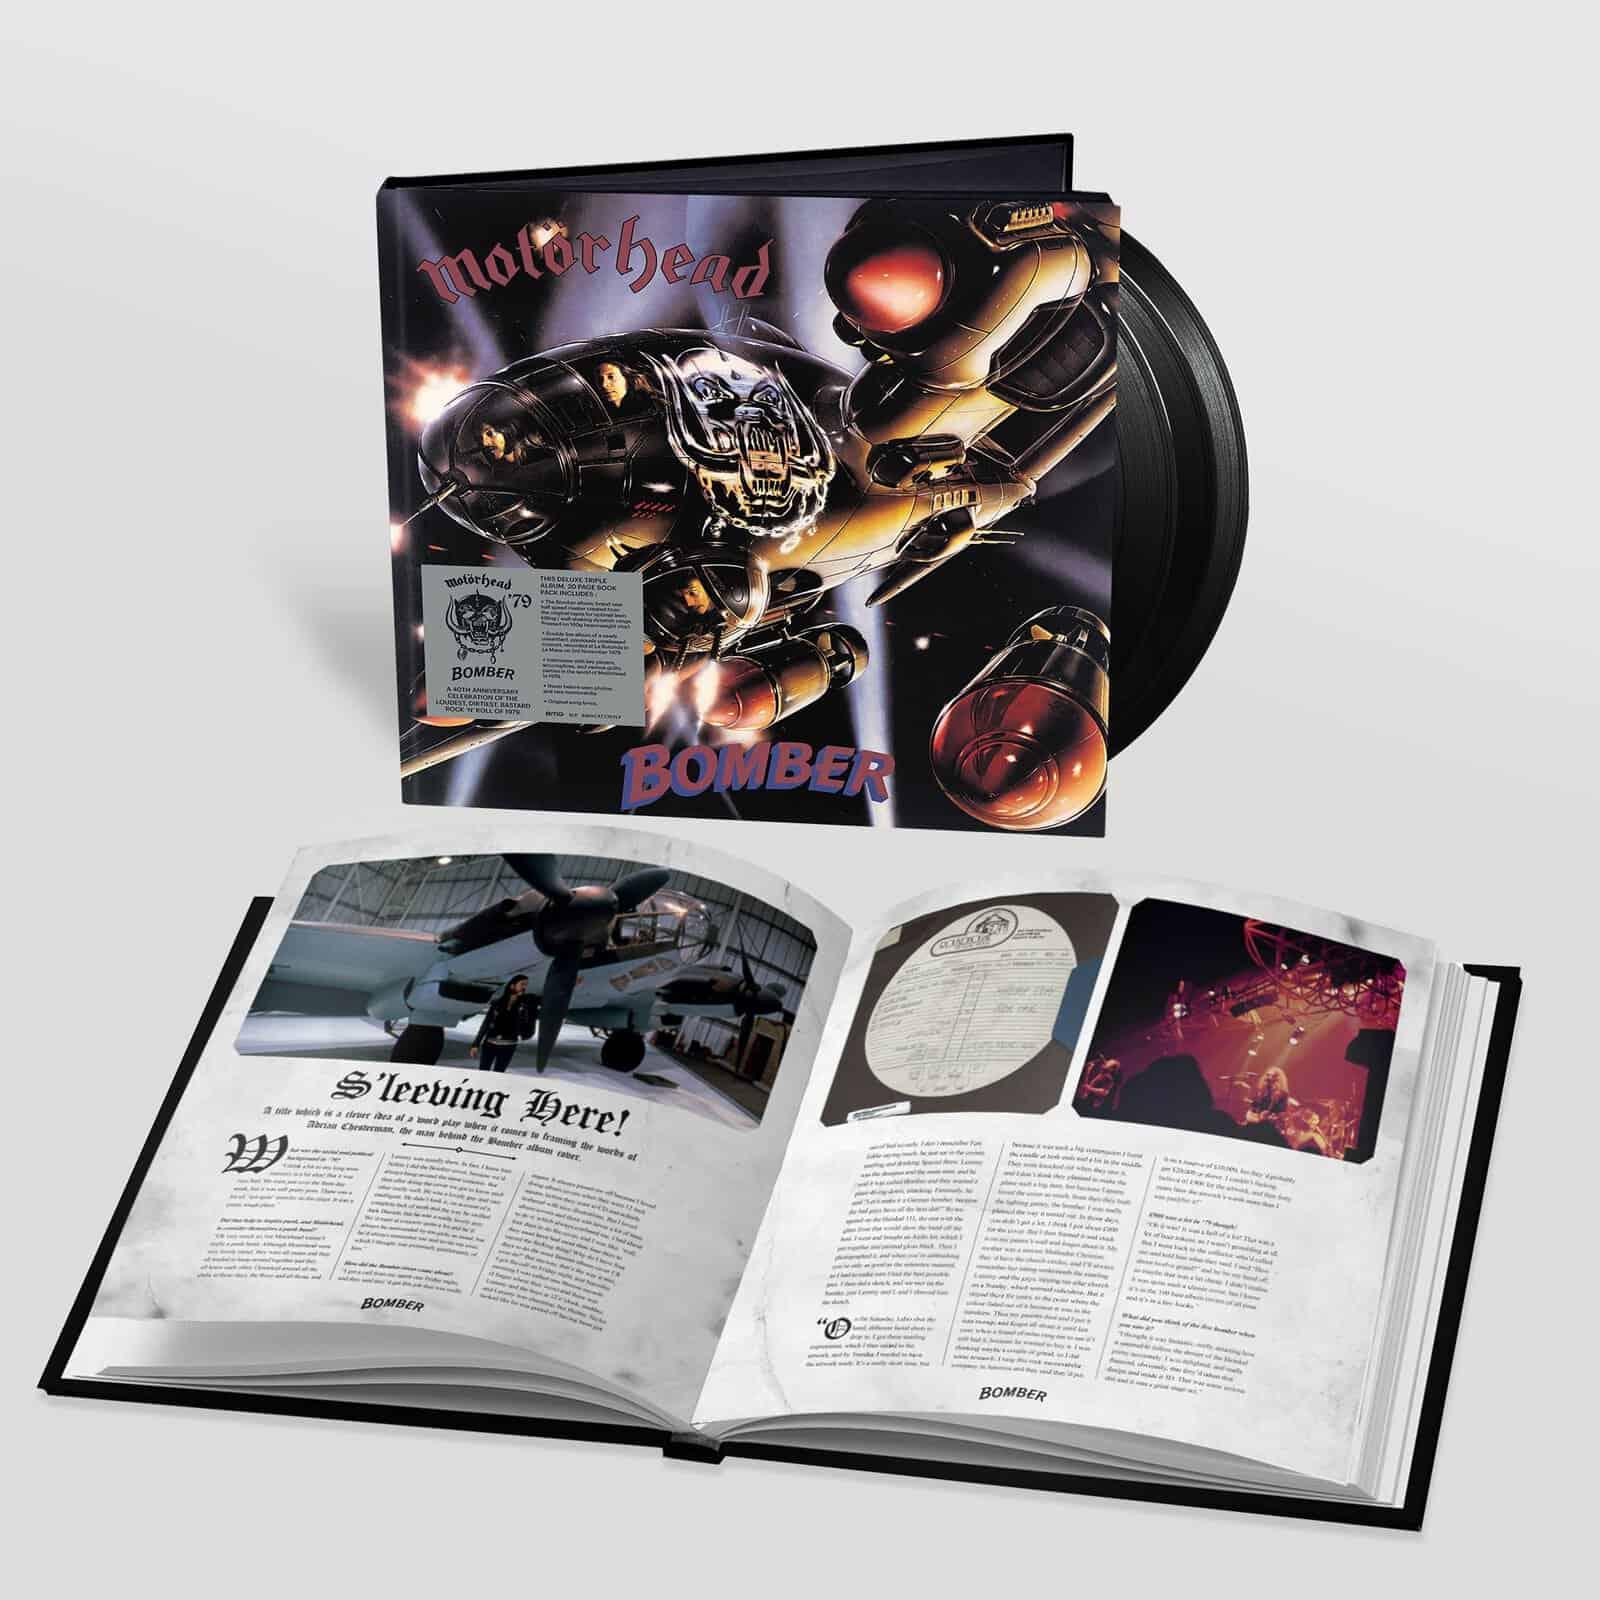 Bomber 40th Anniversary Deluxe 3 Album Edition